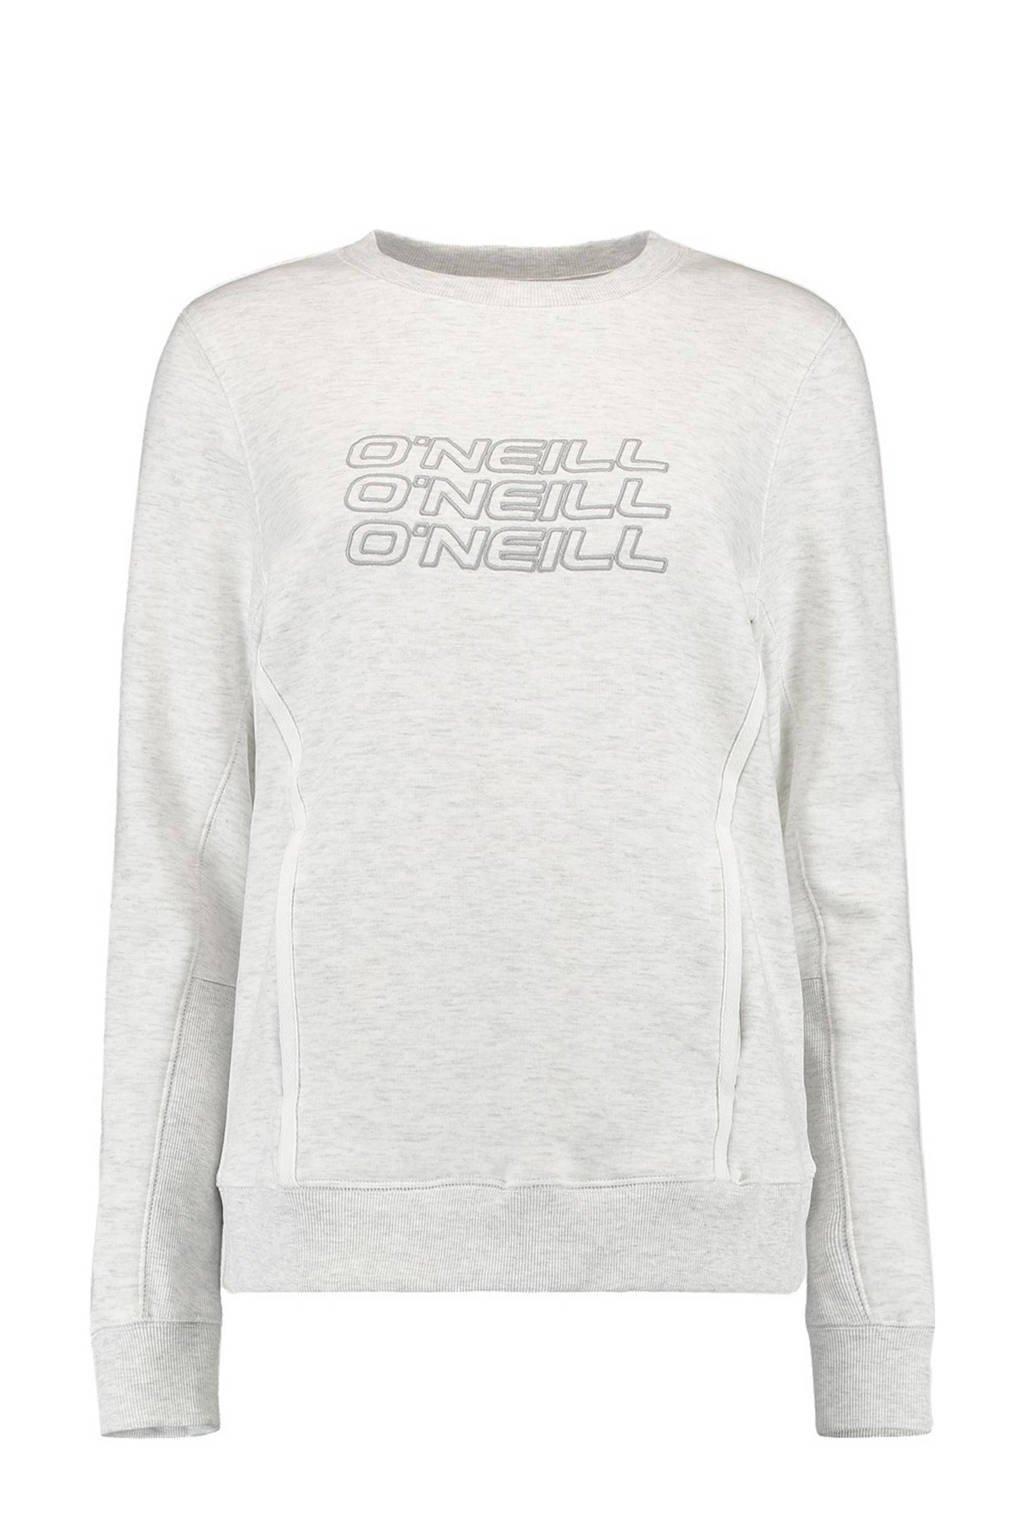 O'Neill sweater wit, Wit